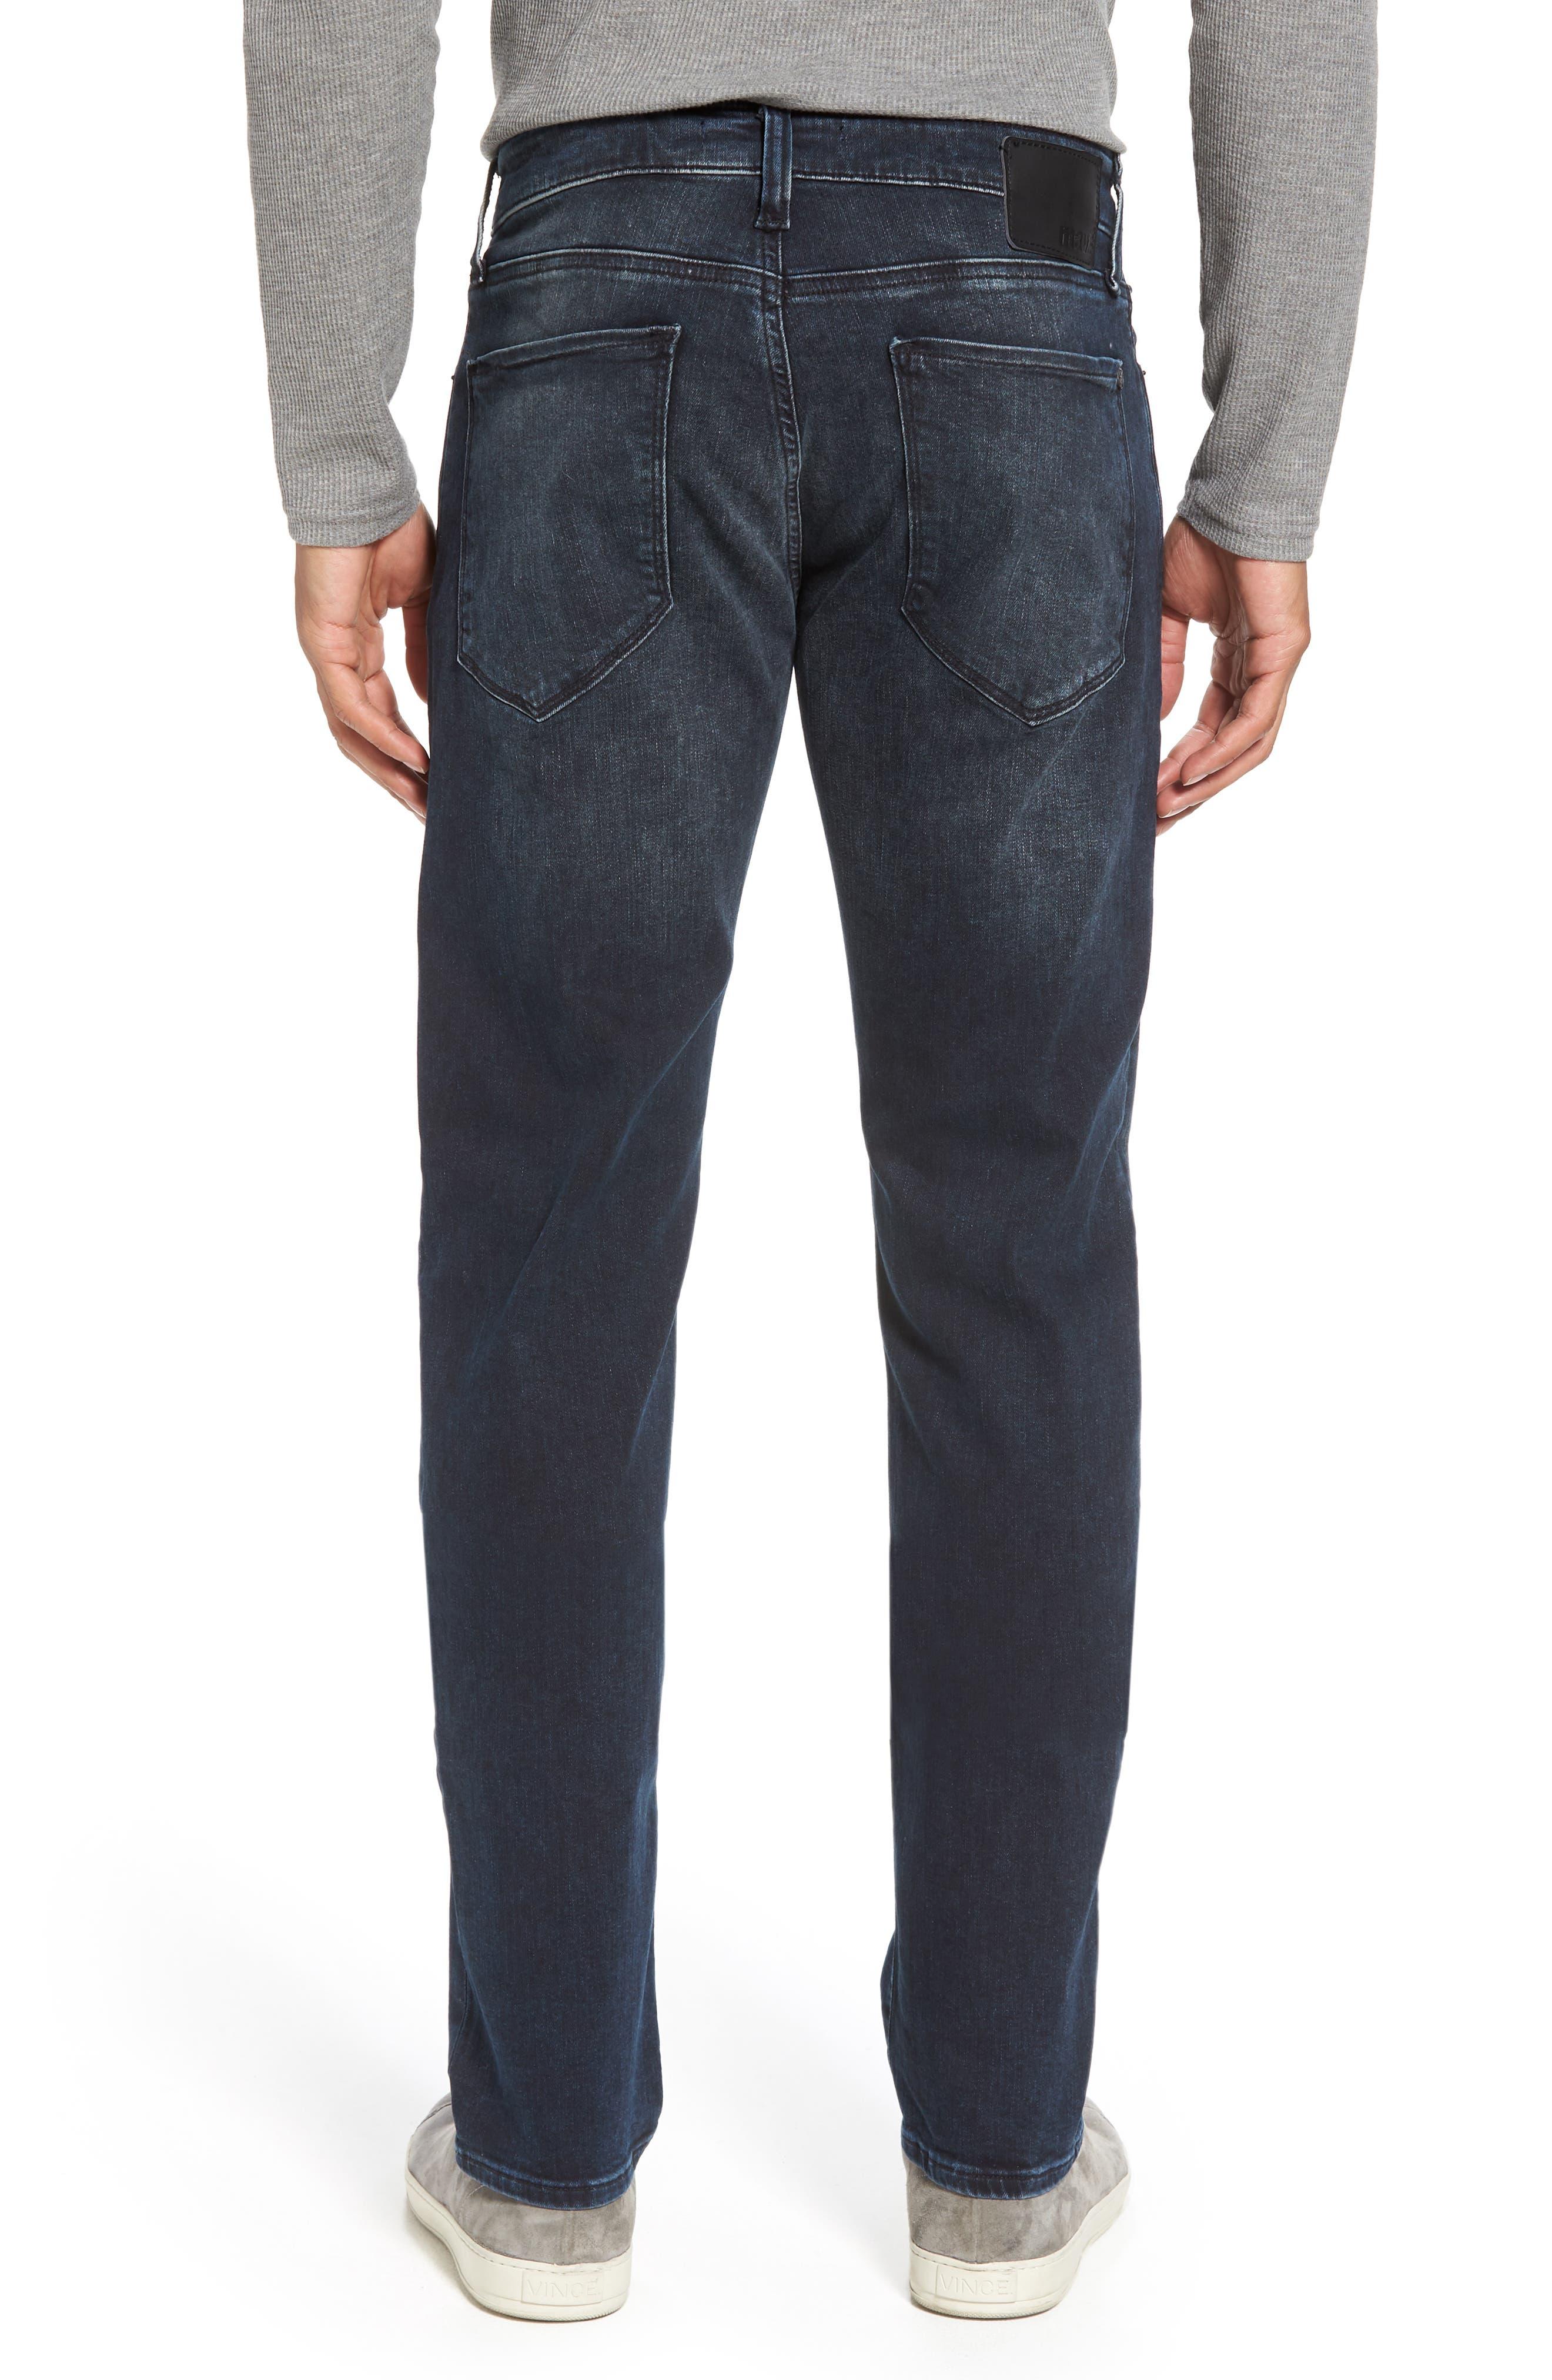 Jake Slim Fit Jeans,                             Alternate thumbnail 2, color,                             Ink Used Authentic Vintage